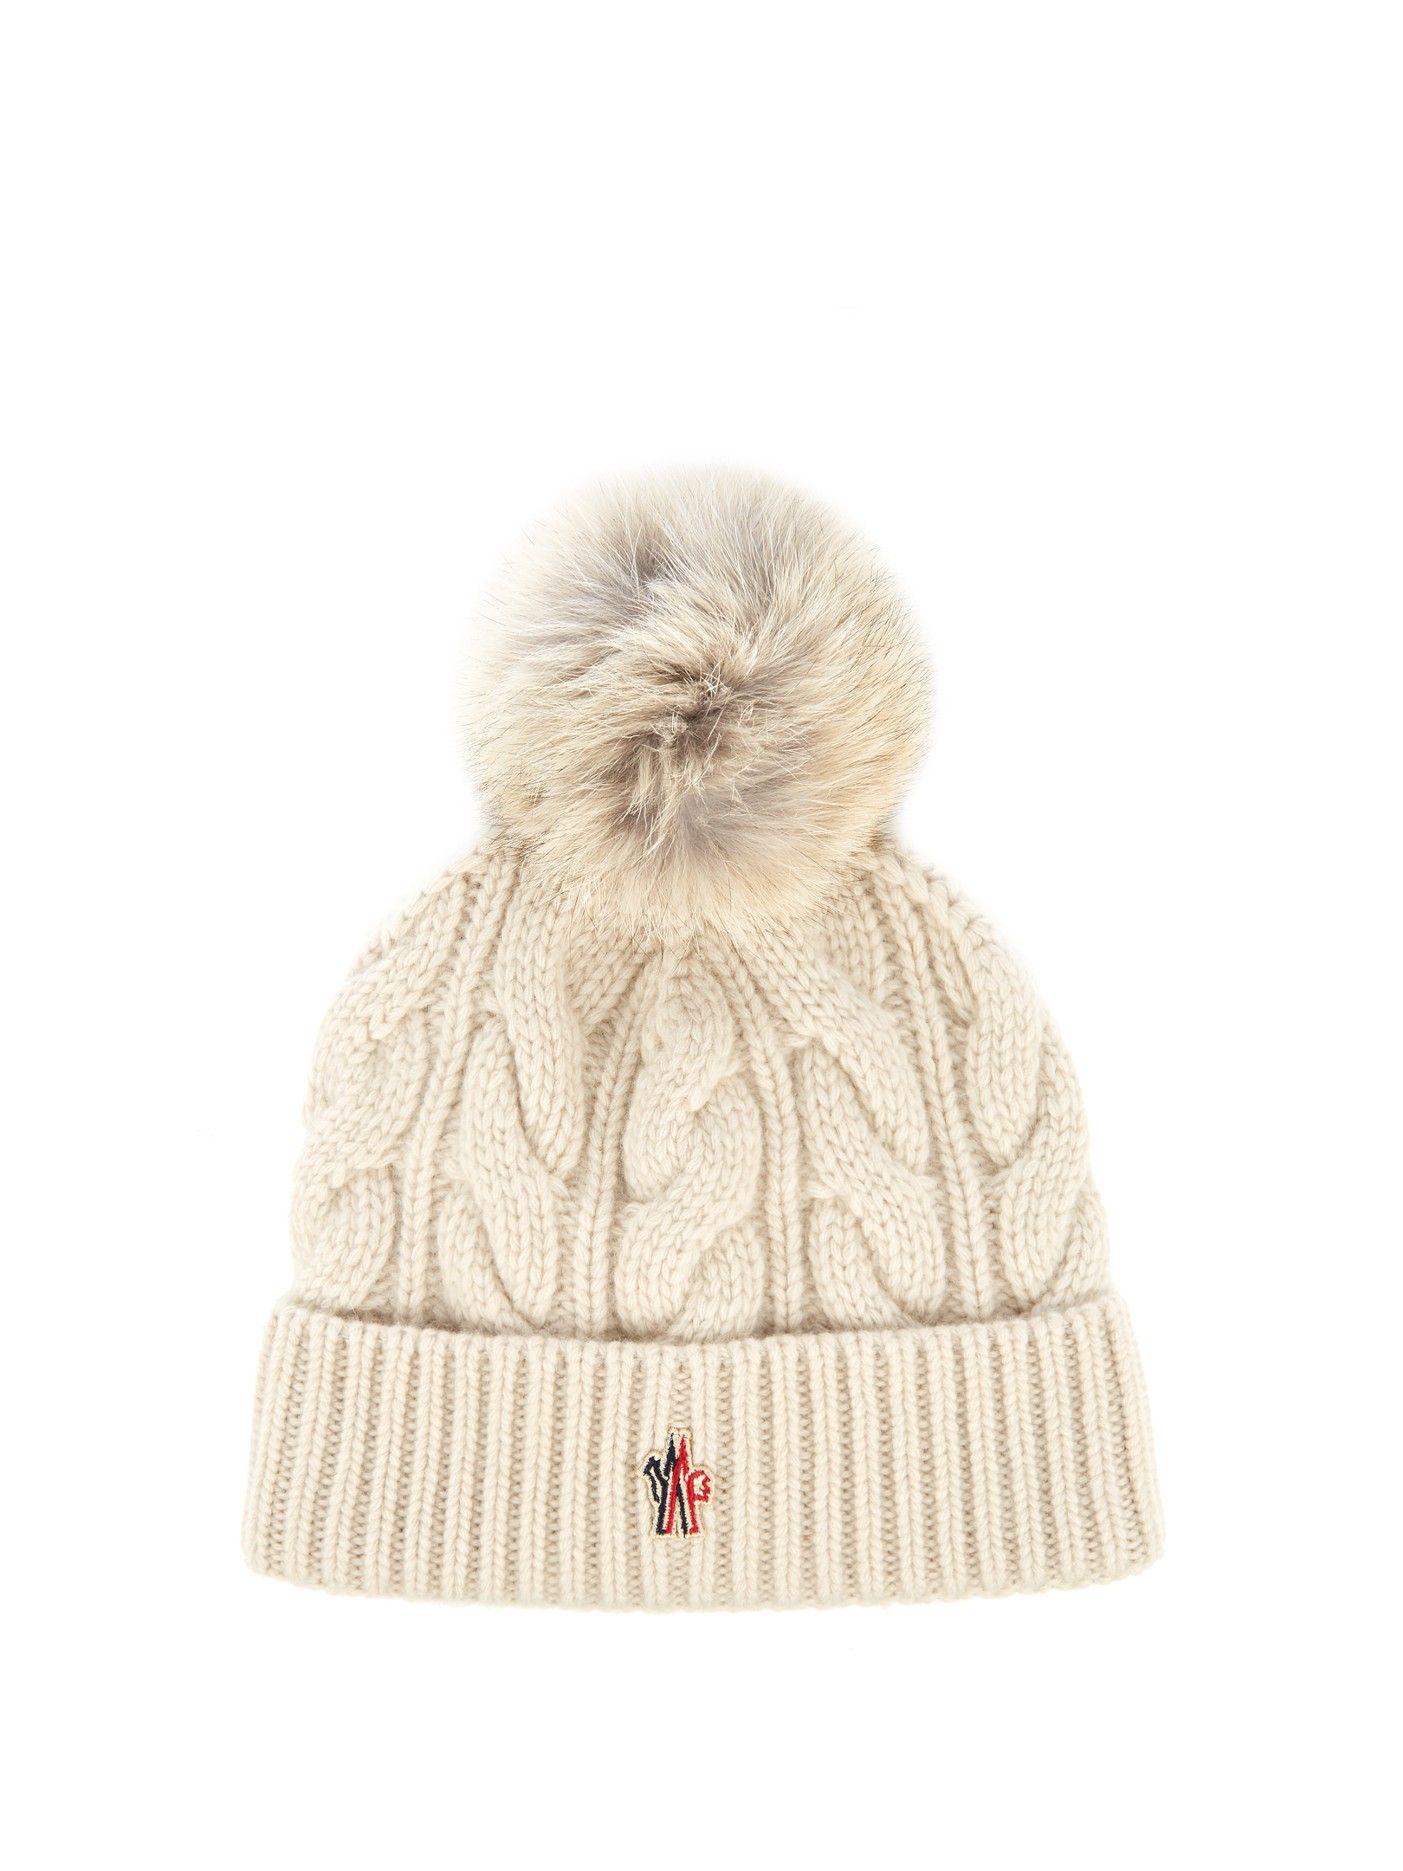 Fur-pompom knitted beanie hat  f37c5fda753e